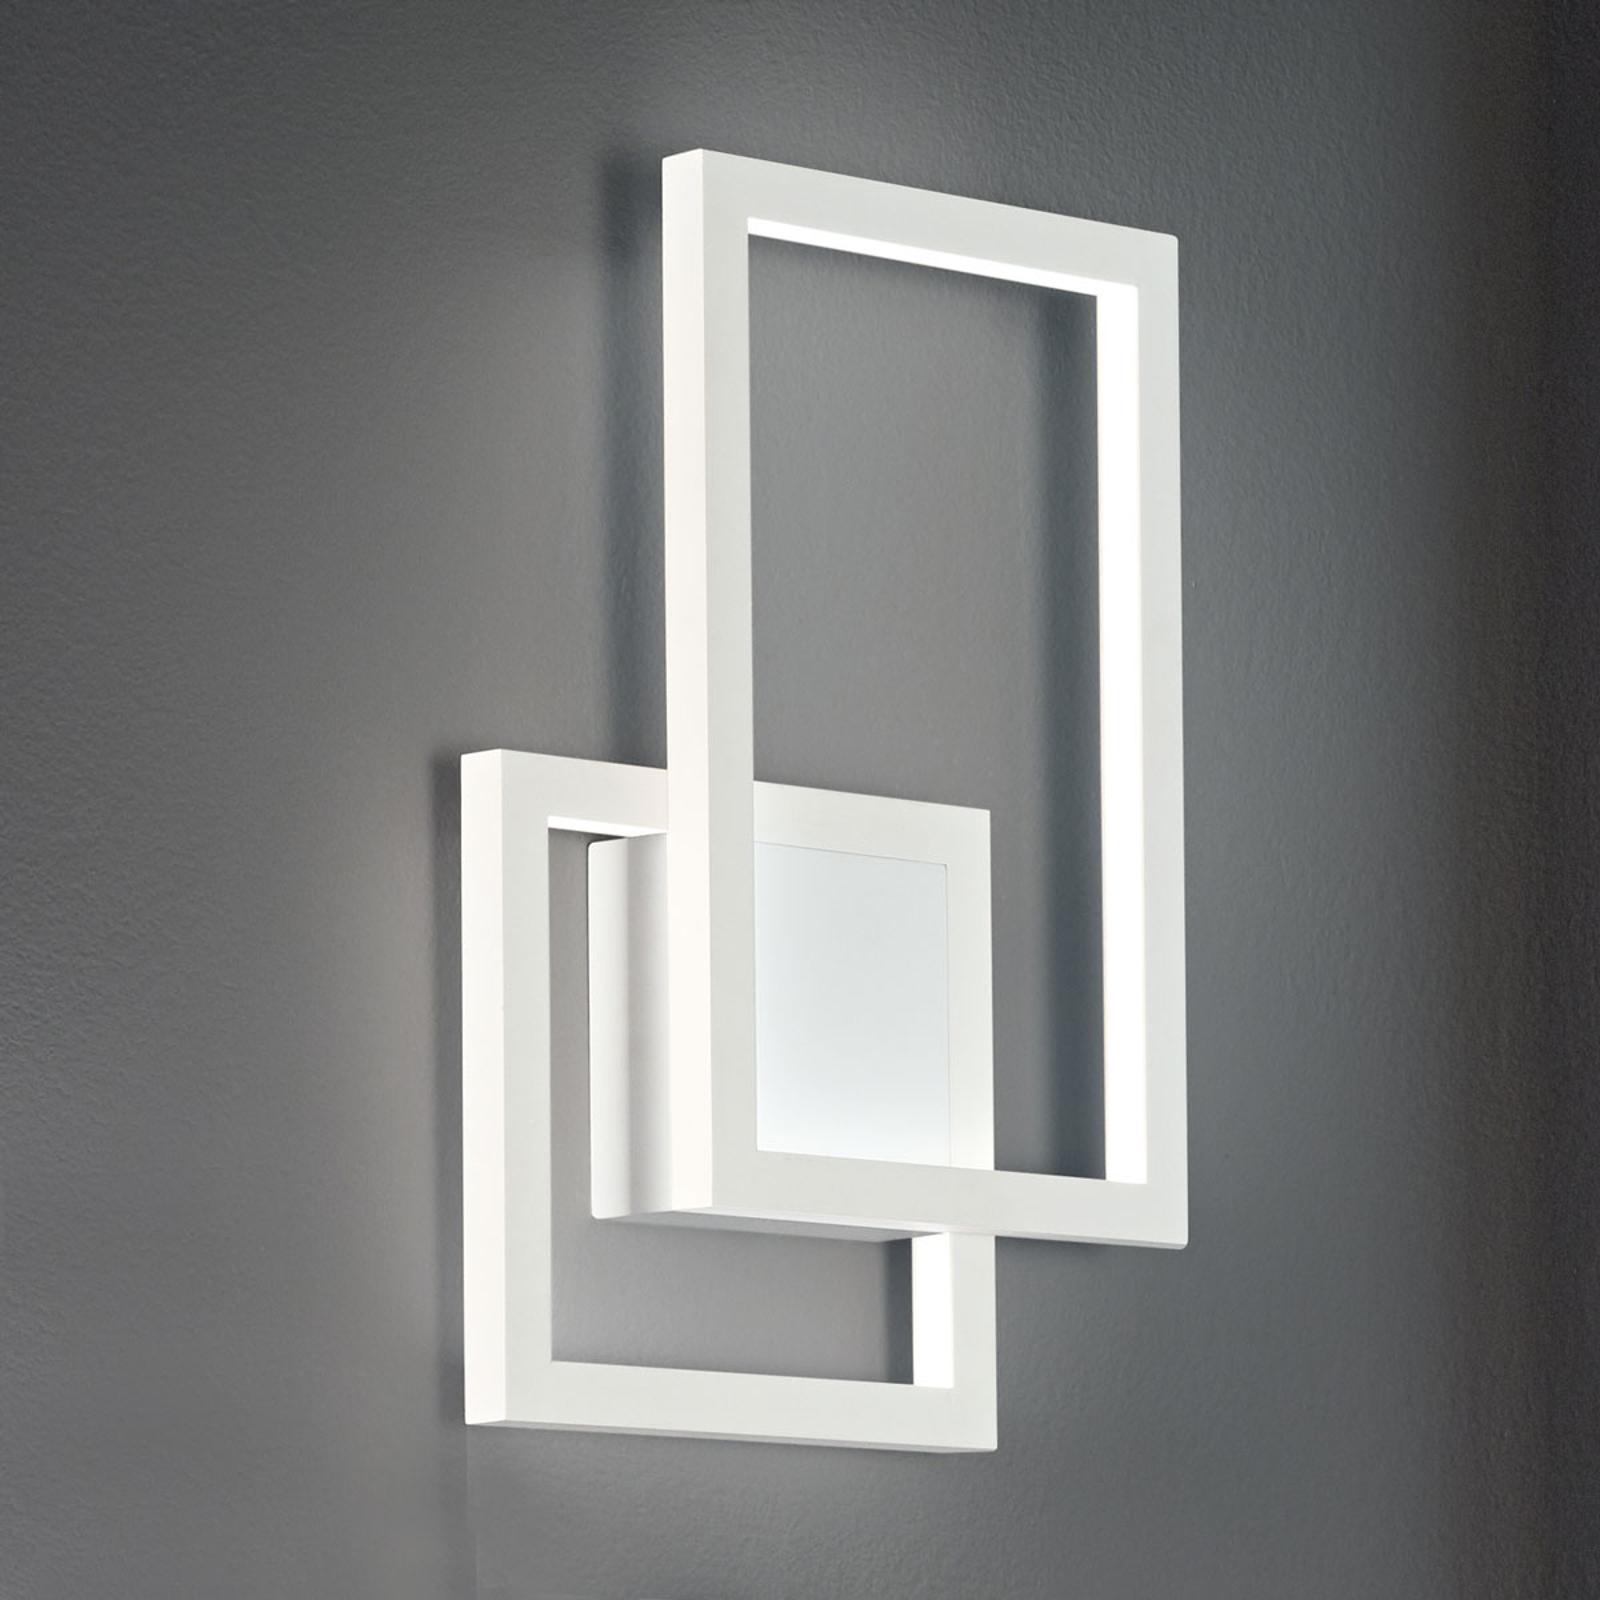 LED-Wandleuchte Cross aus Aluminium